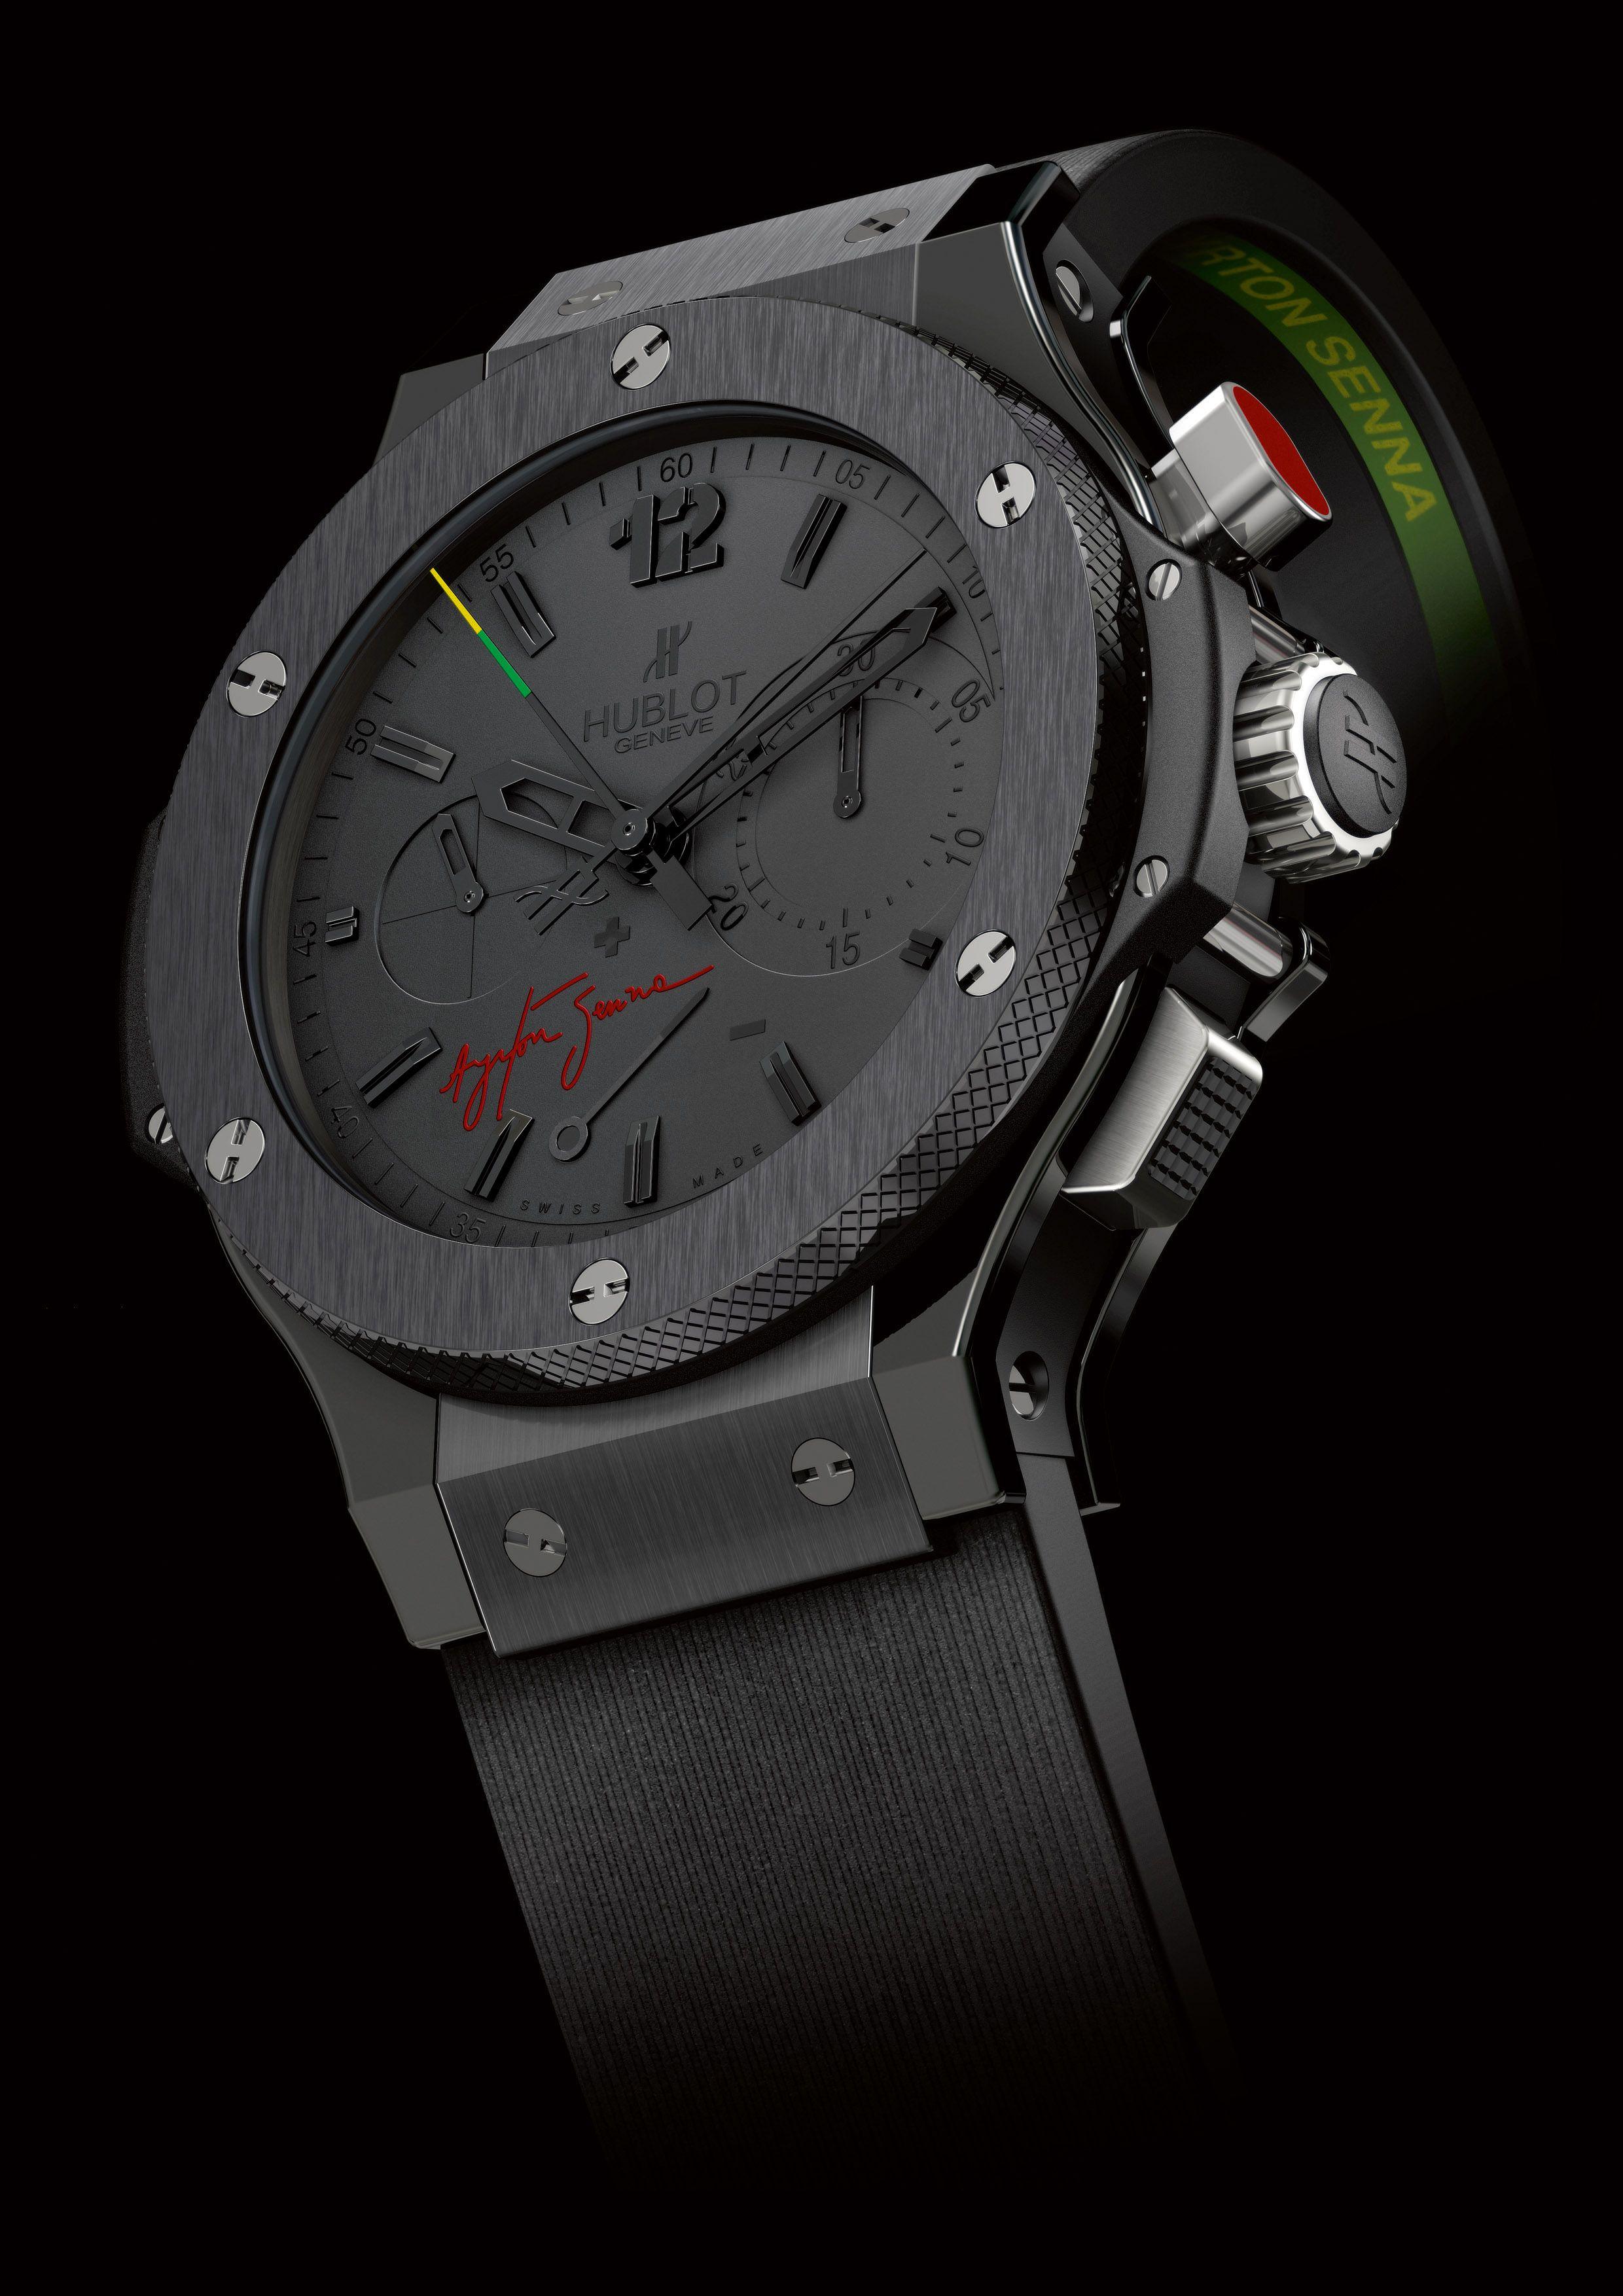 7677da45636 HUBLOT Ayrton Senna Relógios Hublot